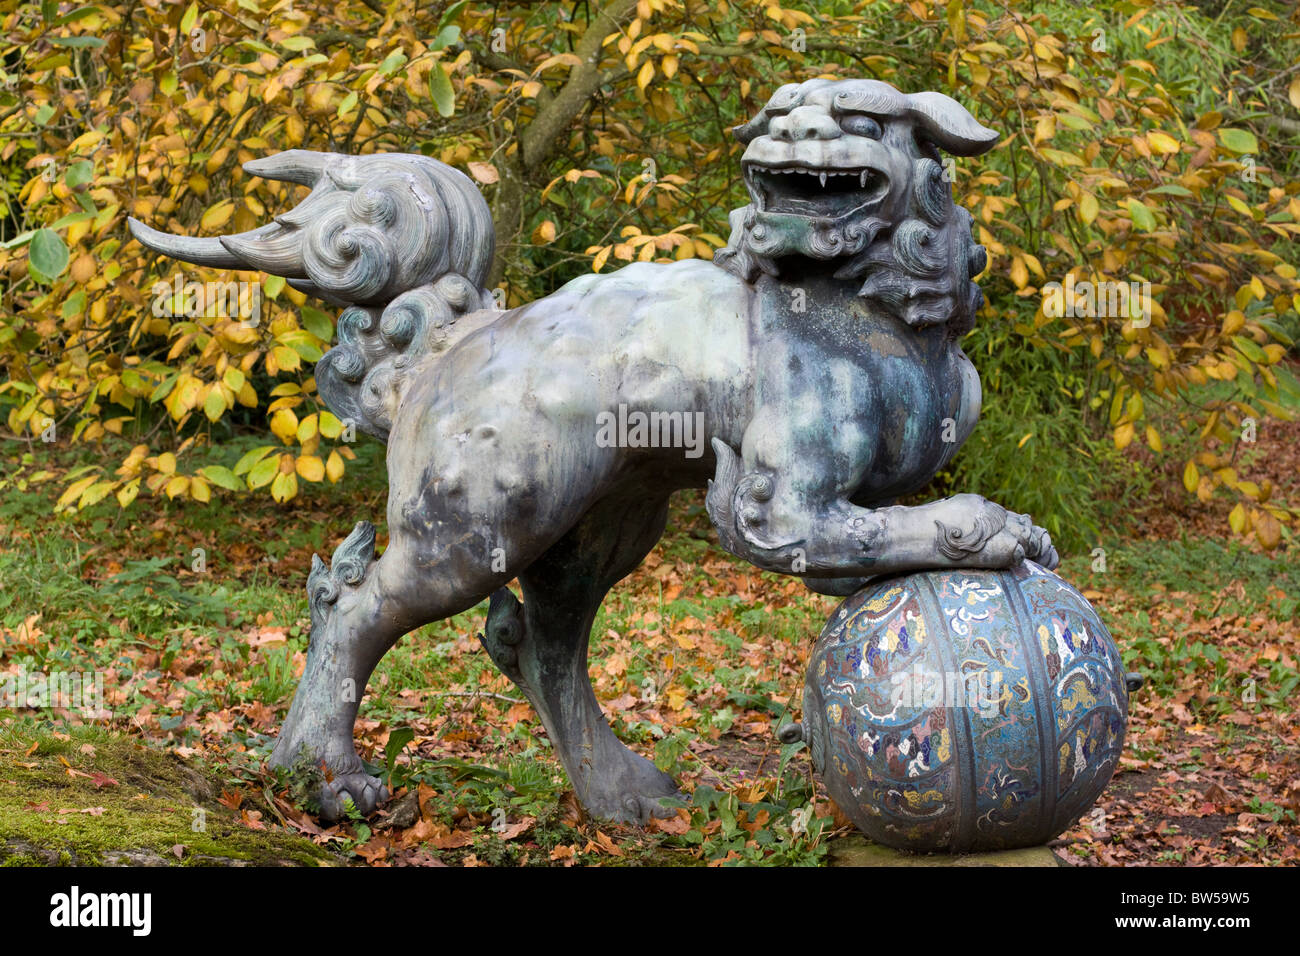 Foo Dog Sculpture on ball - Stock Image